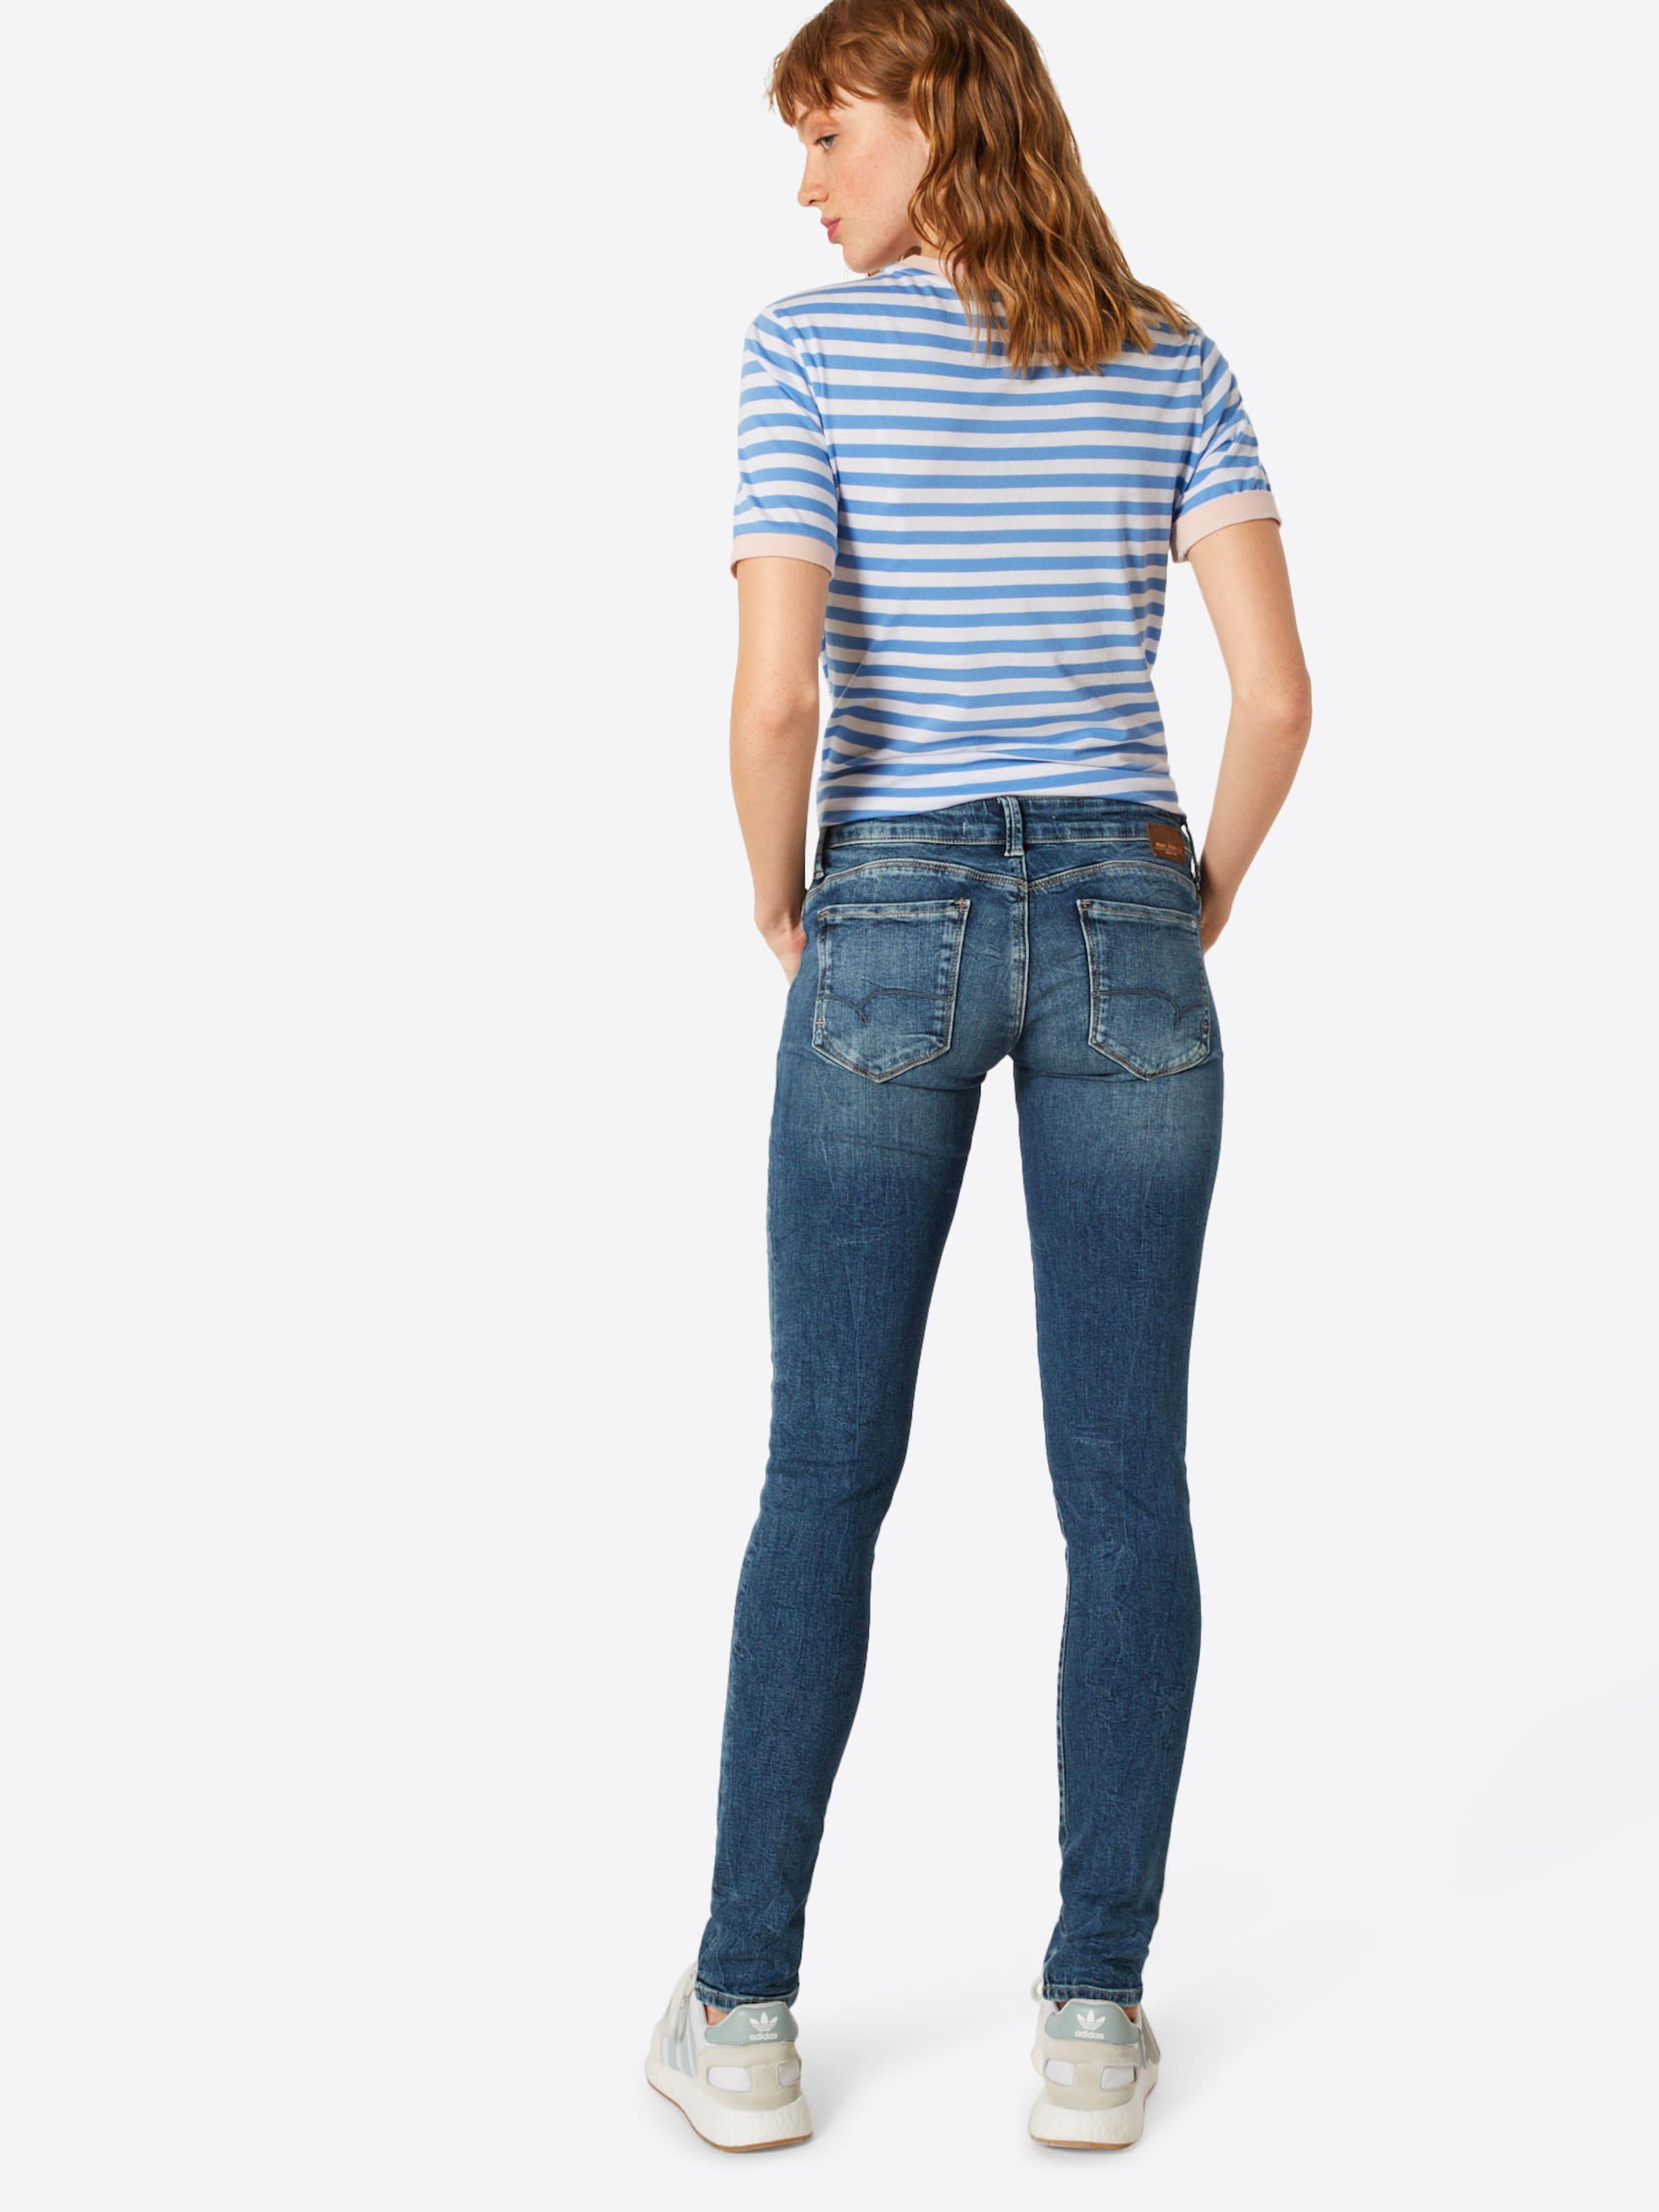 Mavi Mavi 'lindy' In Jeans Dunkelblau Mavi Jeans 'lindy' Dunkelblau Jeans In ybYf76g